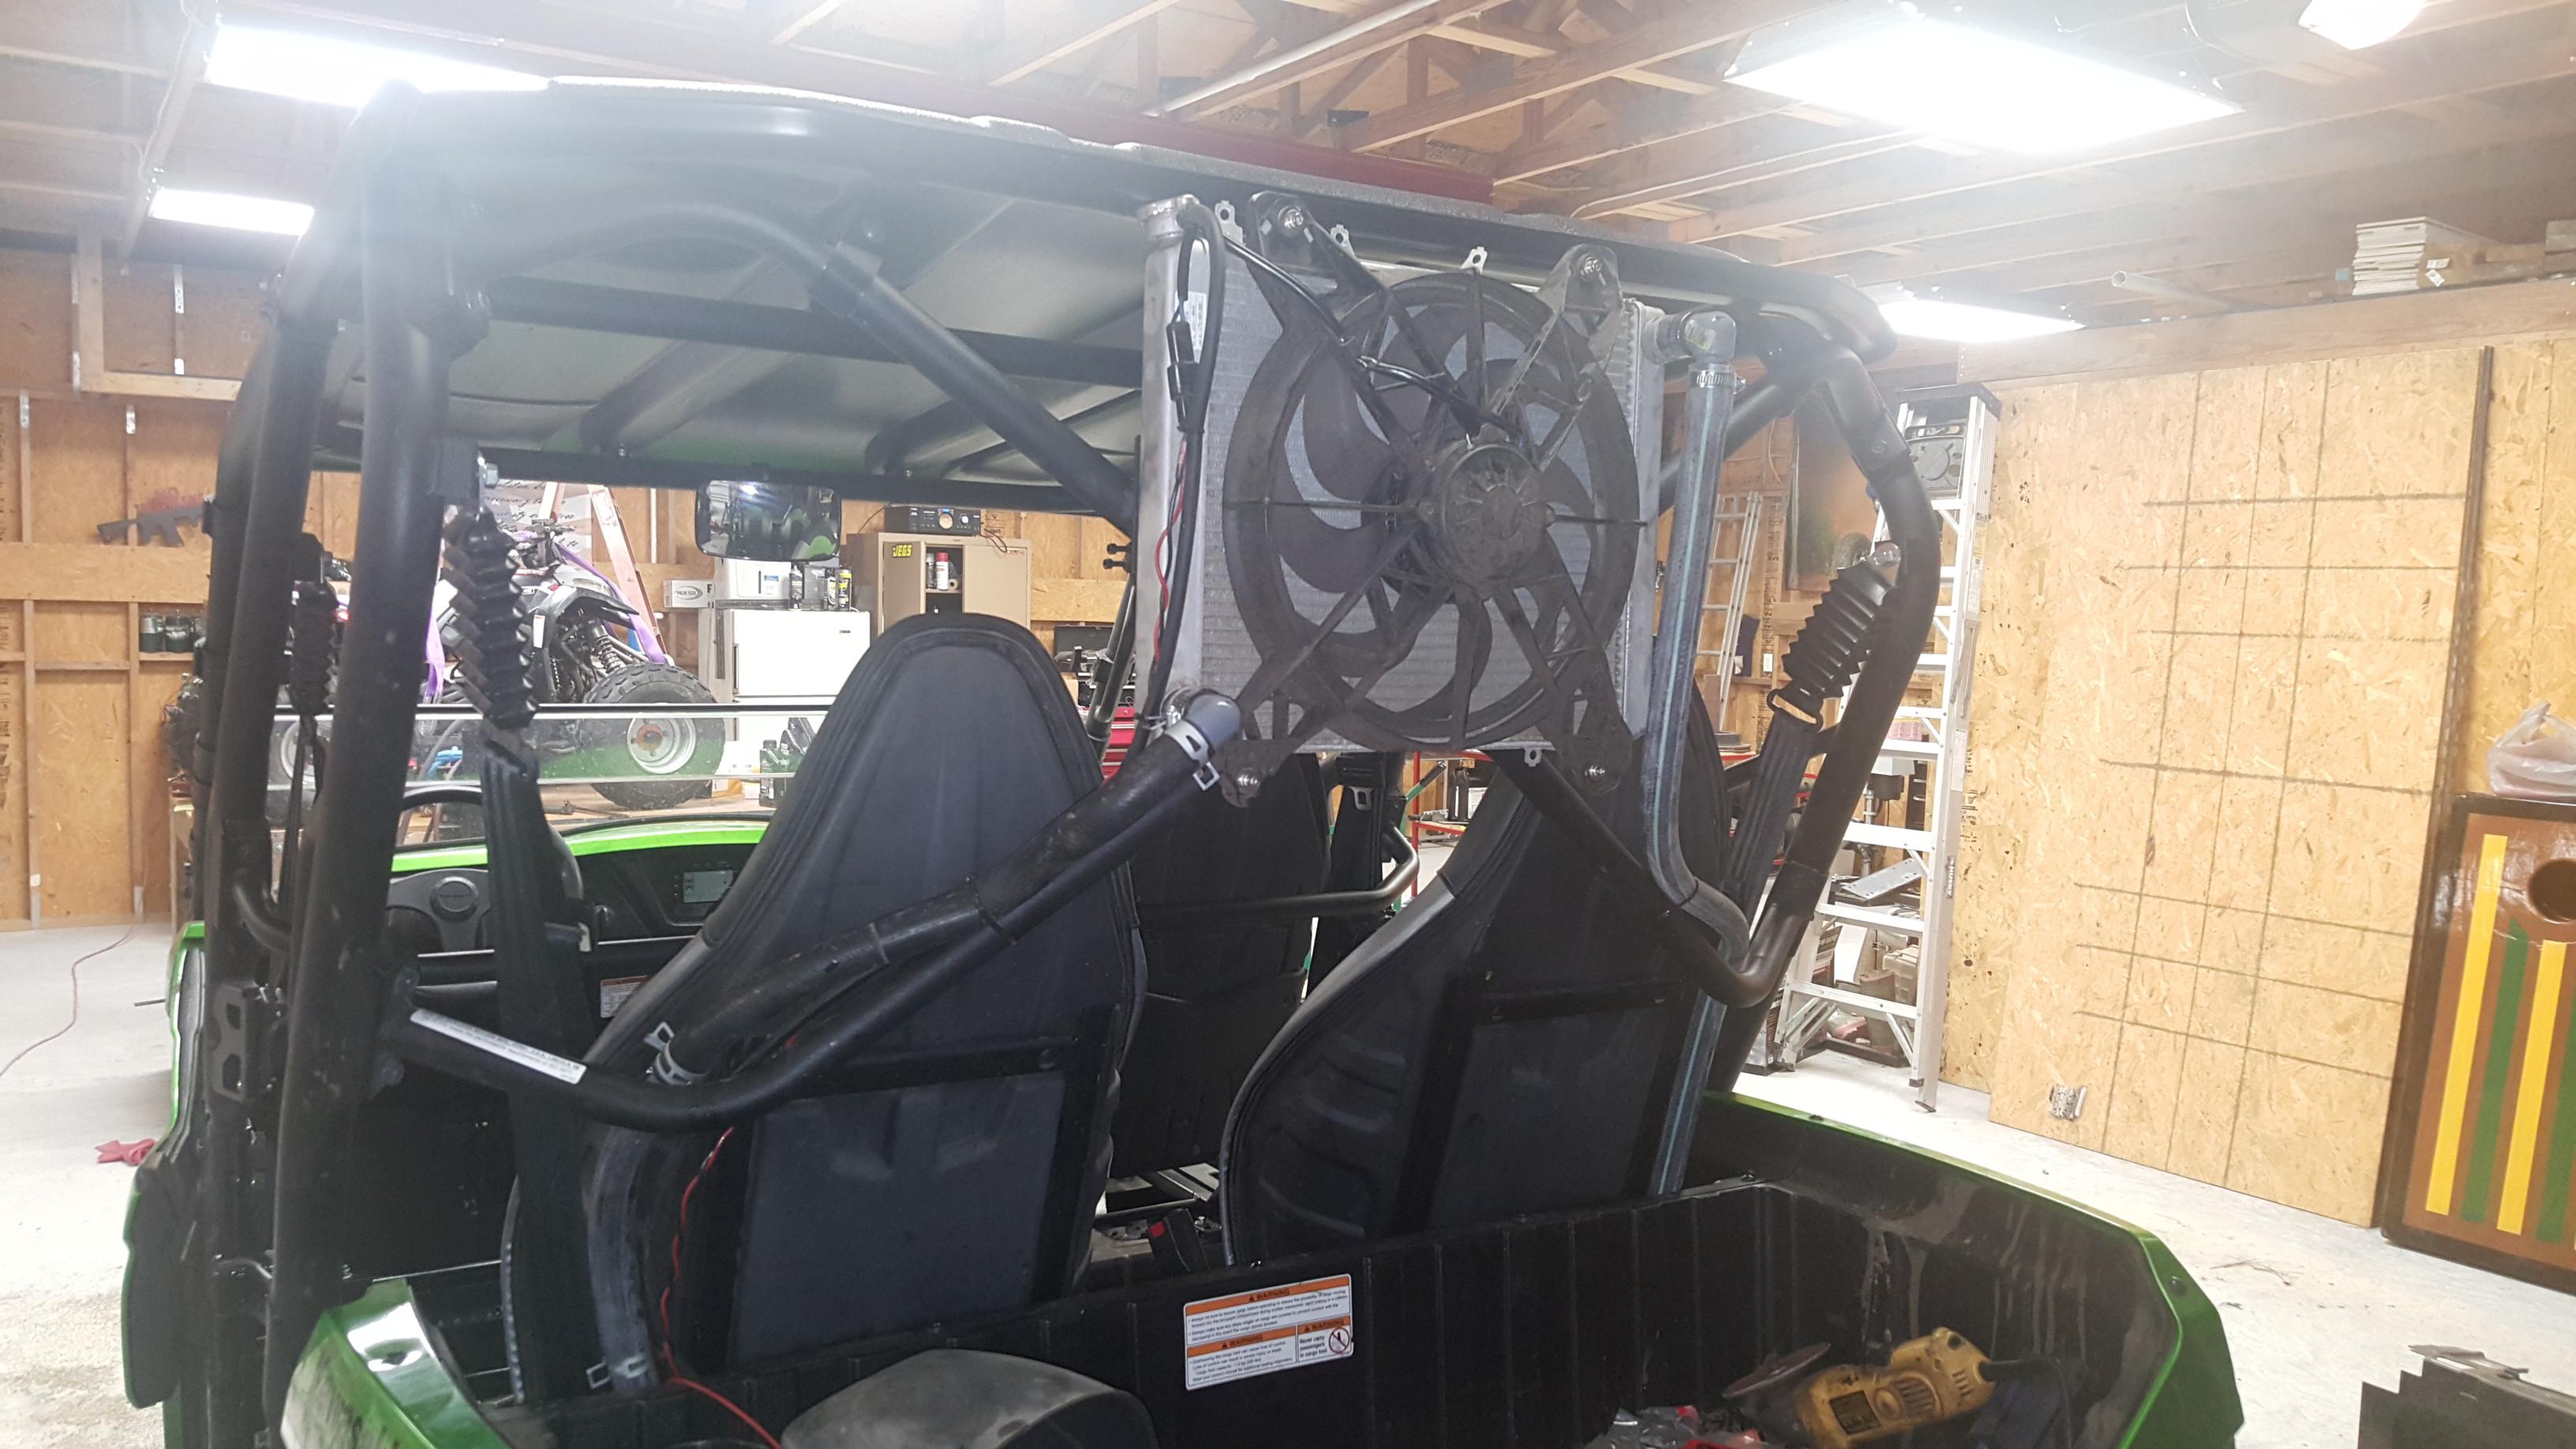 Radiator mud issues- Any Solutions? - Kawasaki Teryx Forum